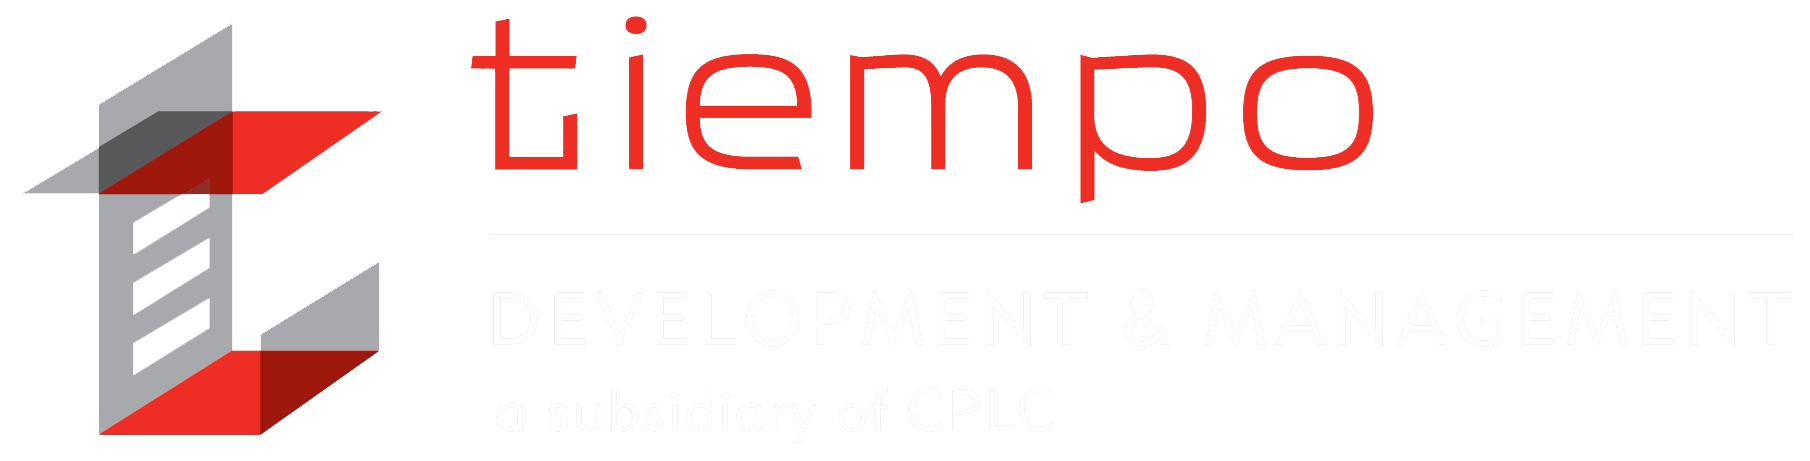 Tempe Property Logo 23